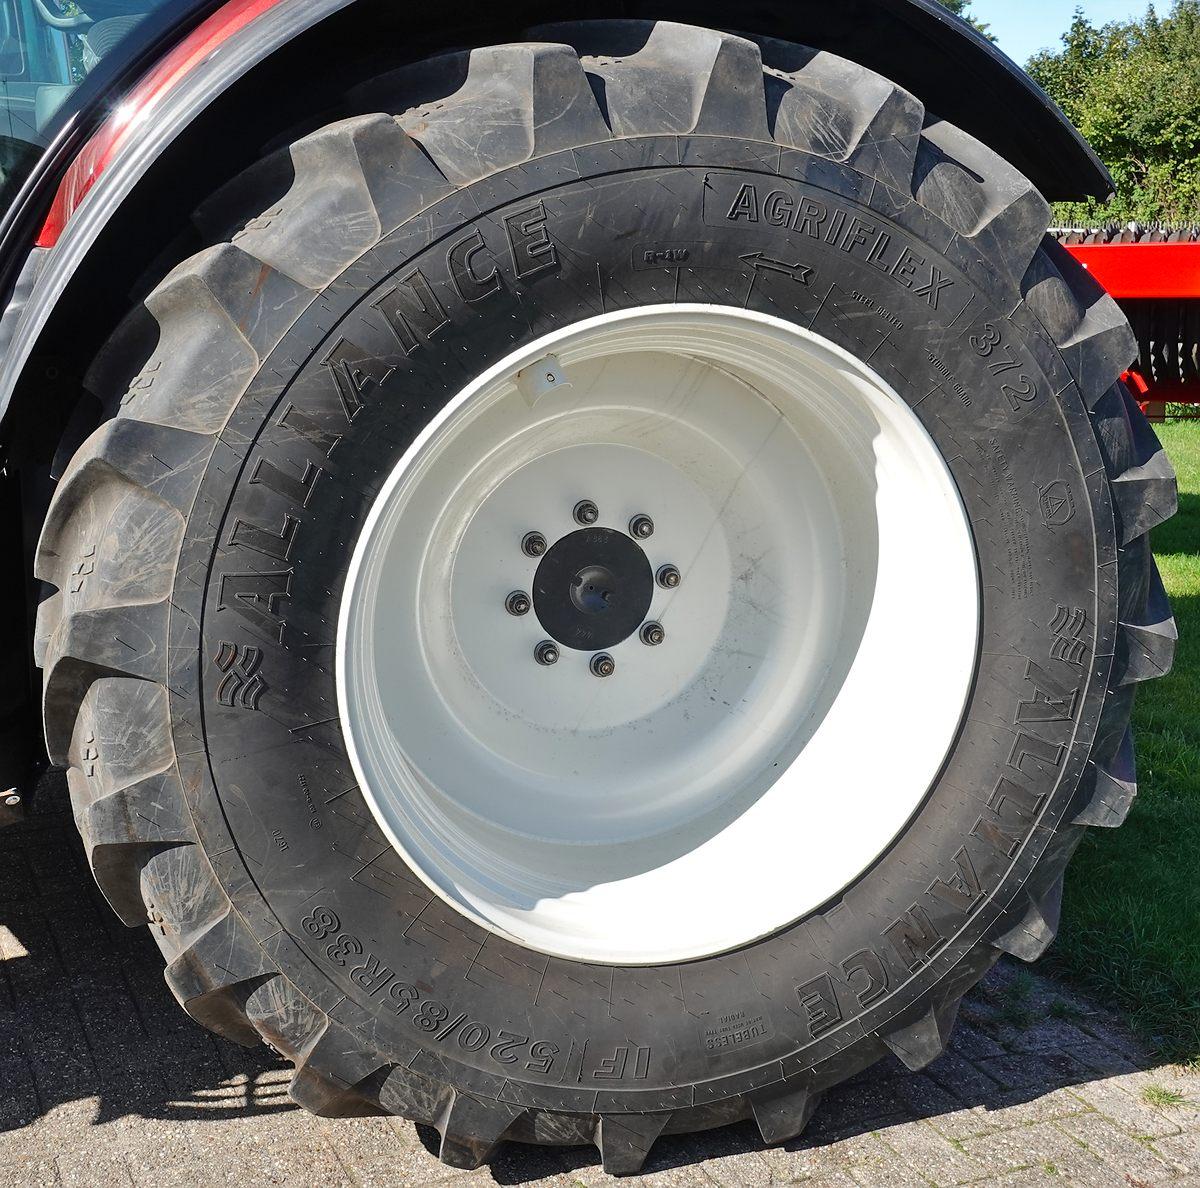 1 Paar Räder 520/85 R 38 Alliance Agrifles 372 167 D